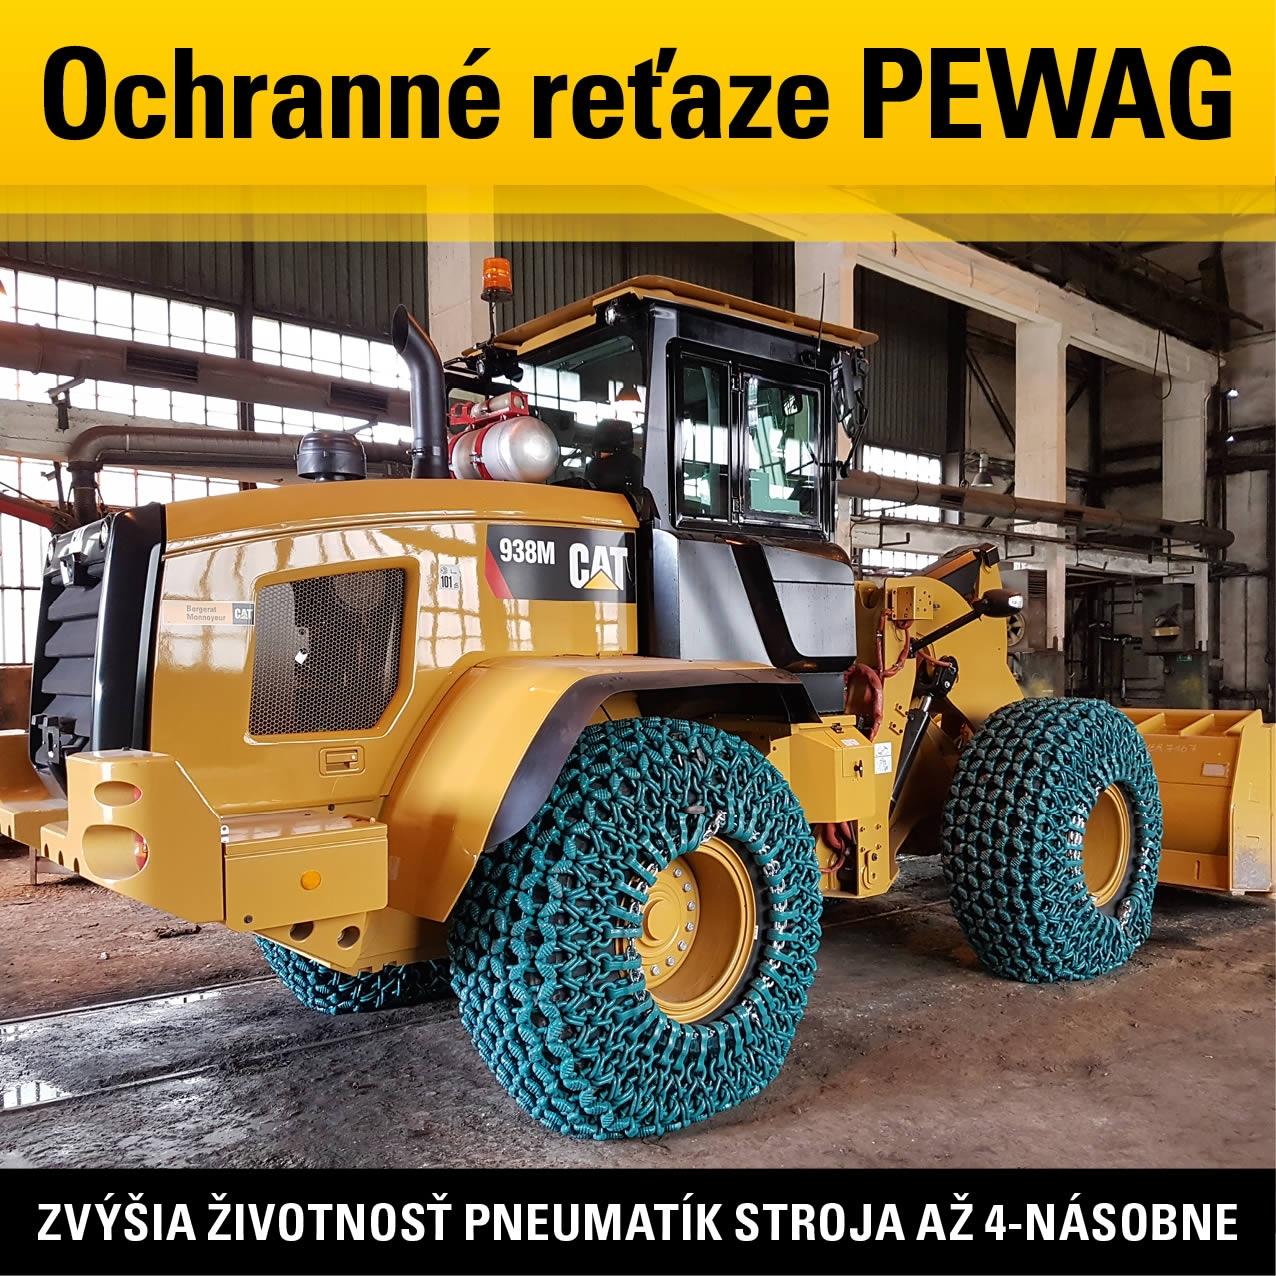 Ochranné reťaze Pewag